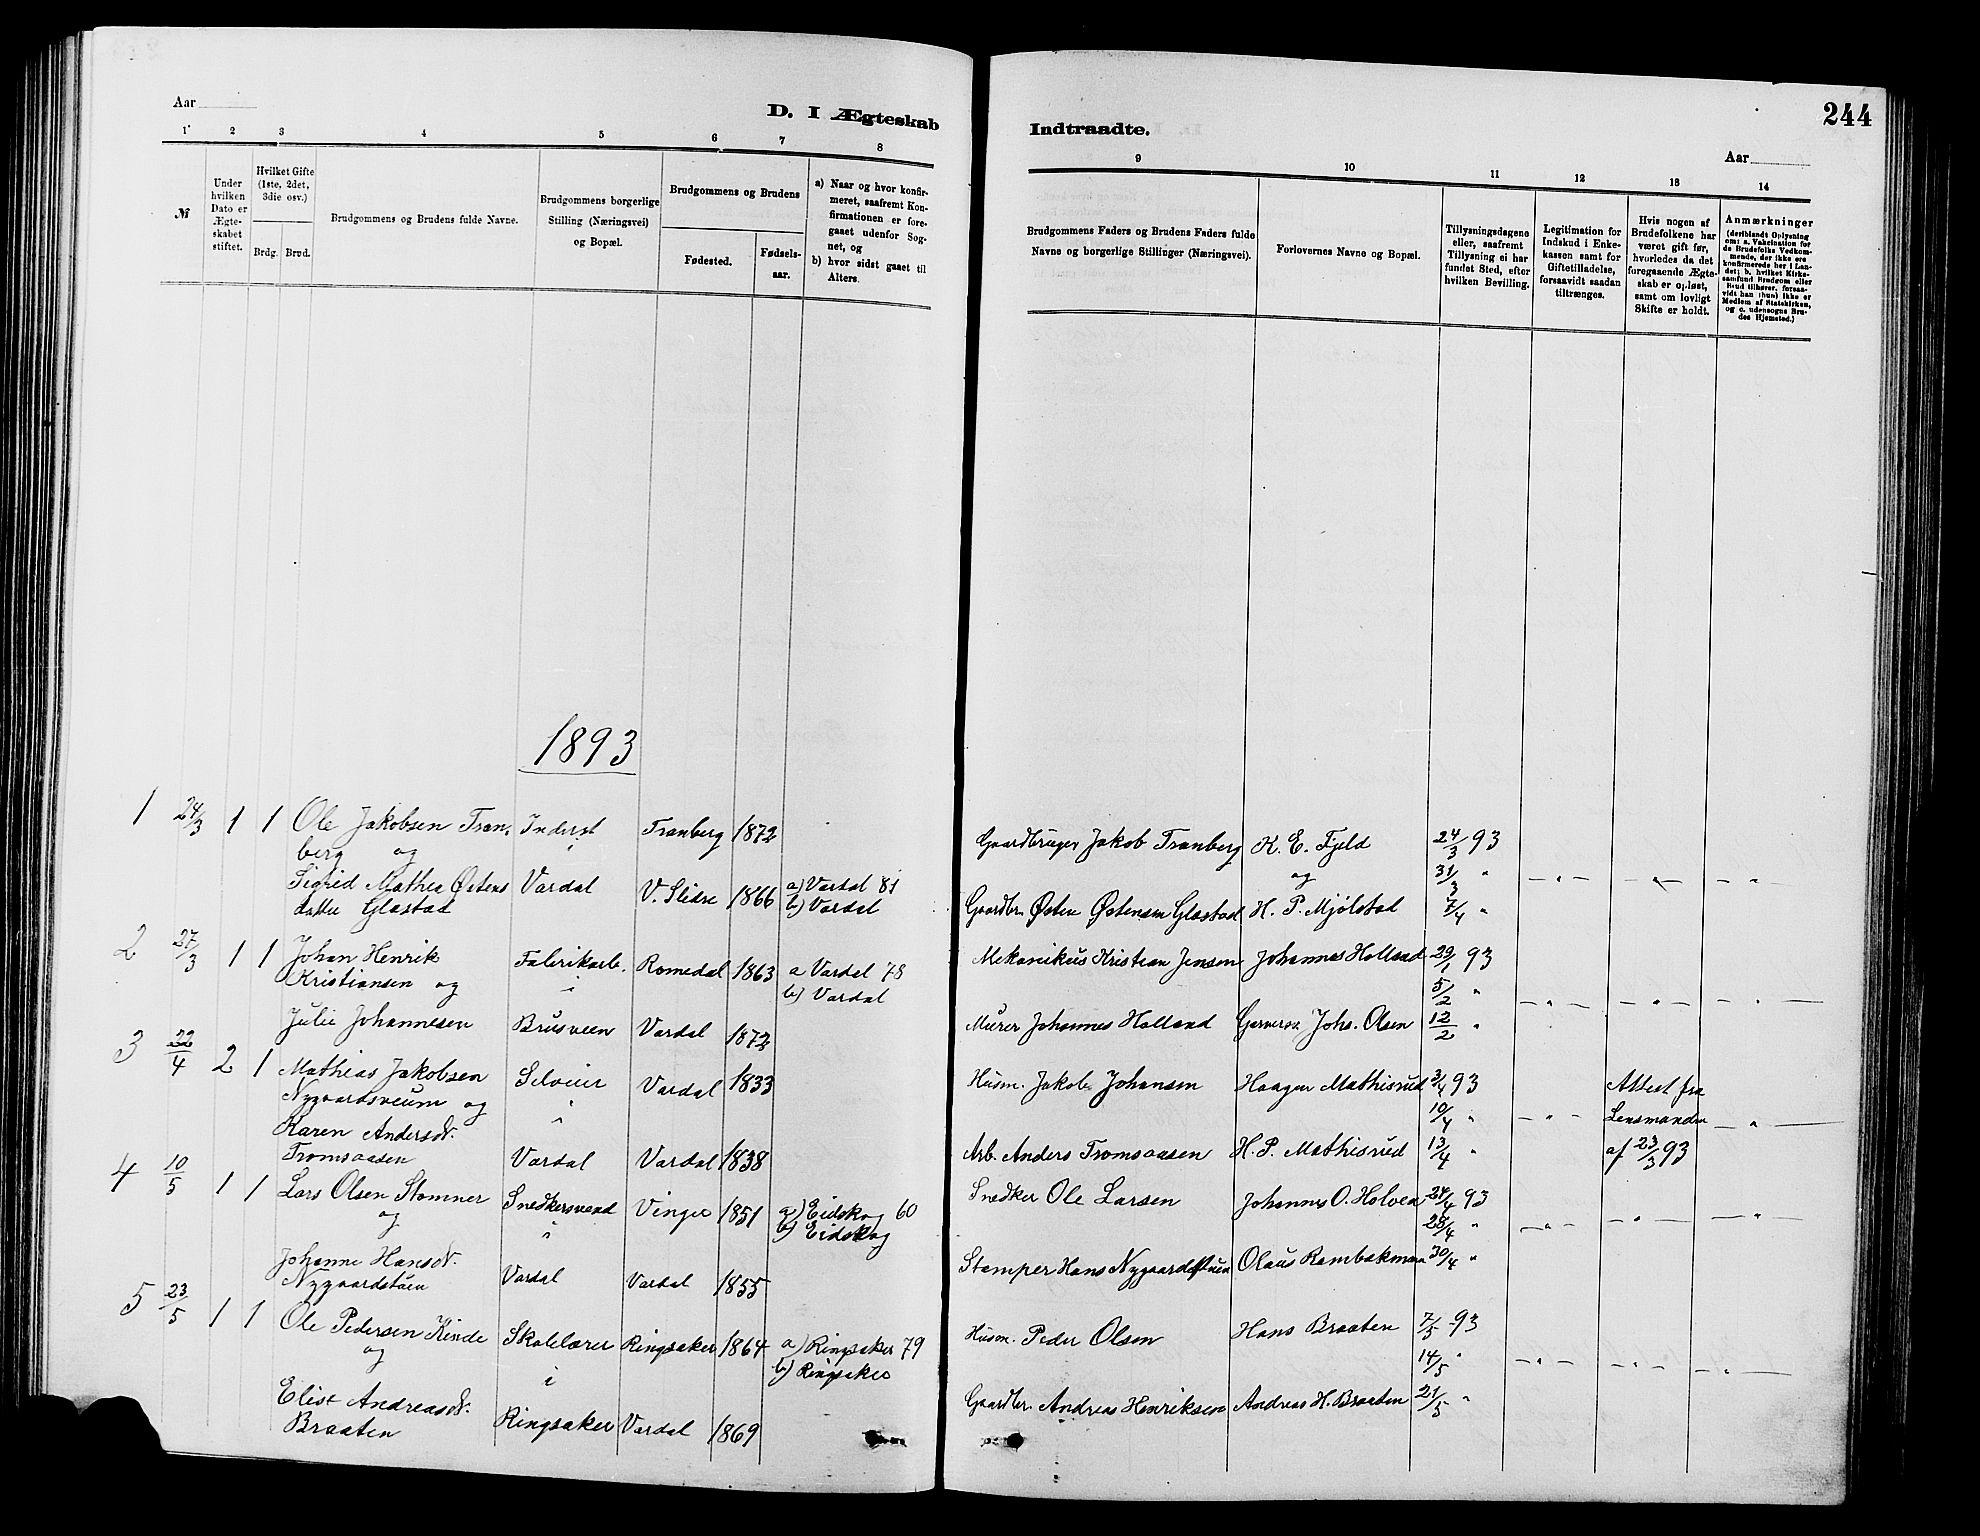 SAH, Vardal prestekontor, H/Ha/Hab/L0007: Klokkerbok nr. 7 /1, 1881-1895, s. 244